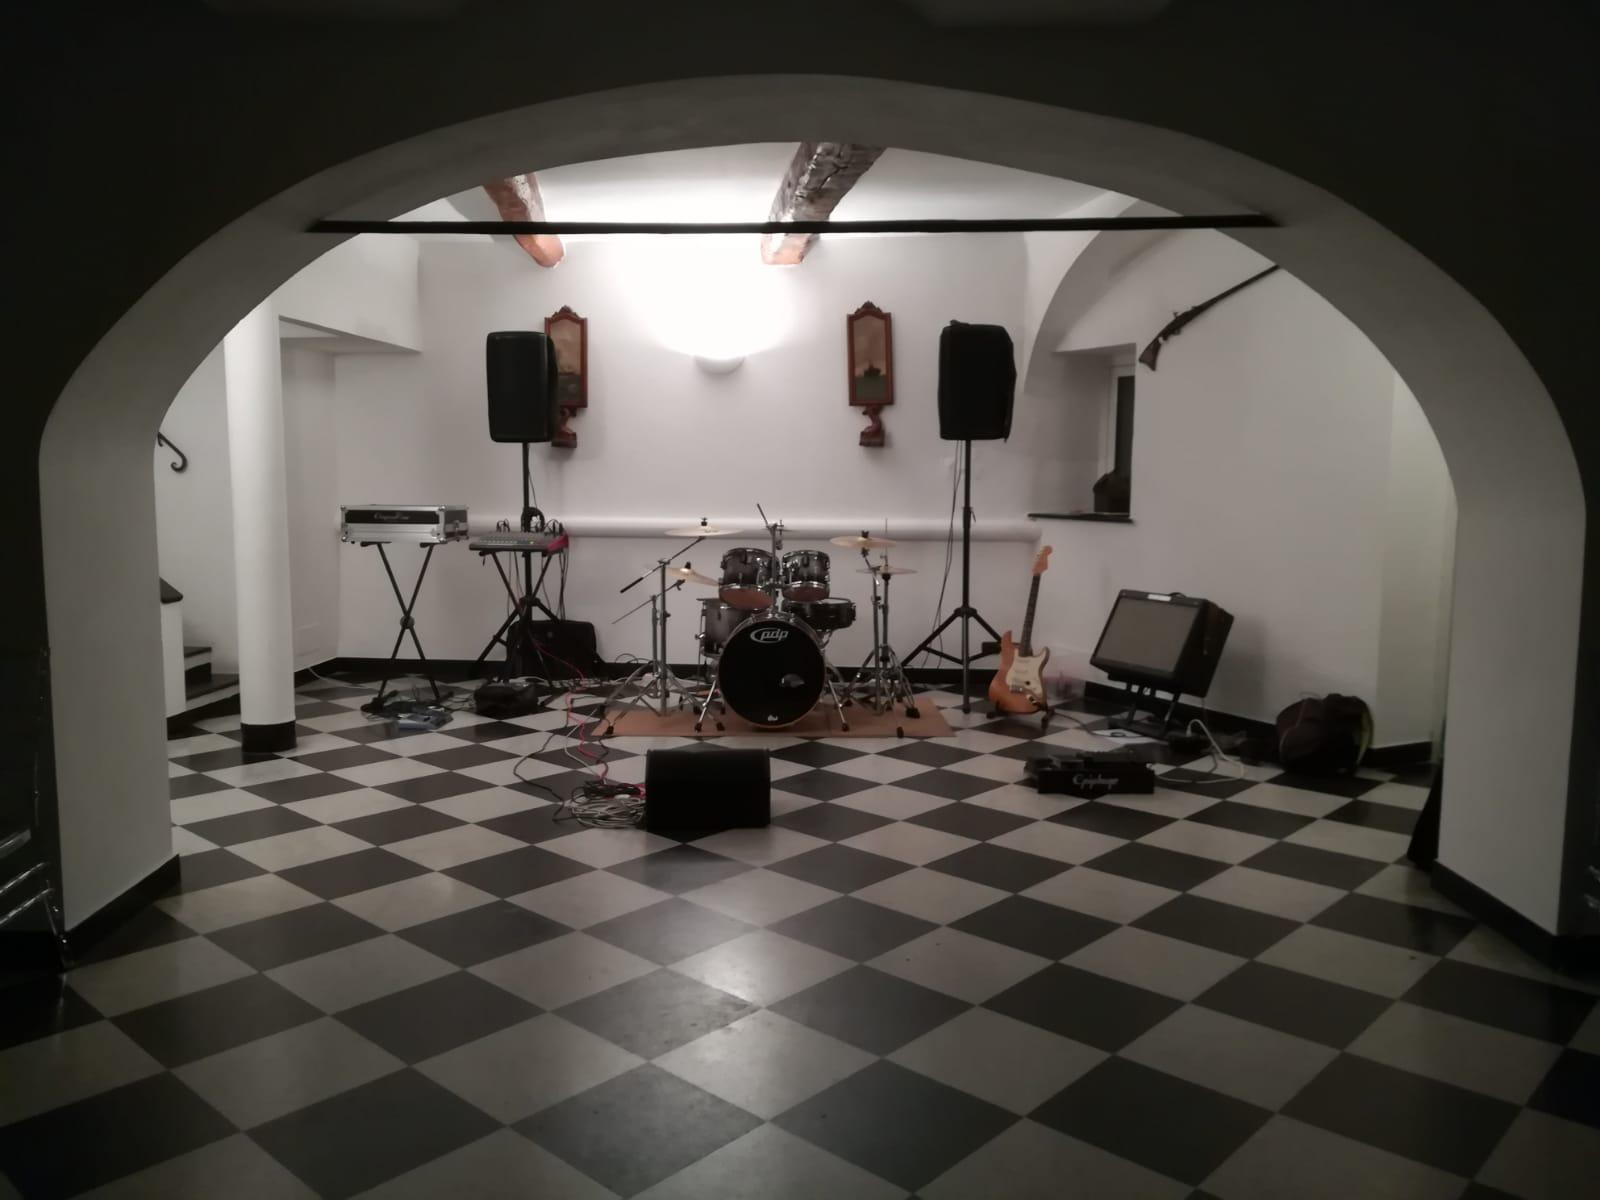 13marco-bertani-mb-musica-regia-video